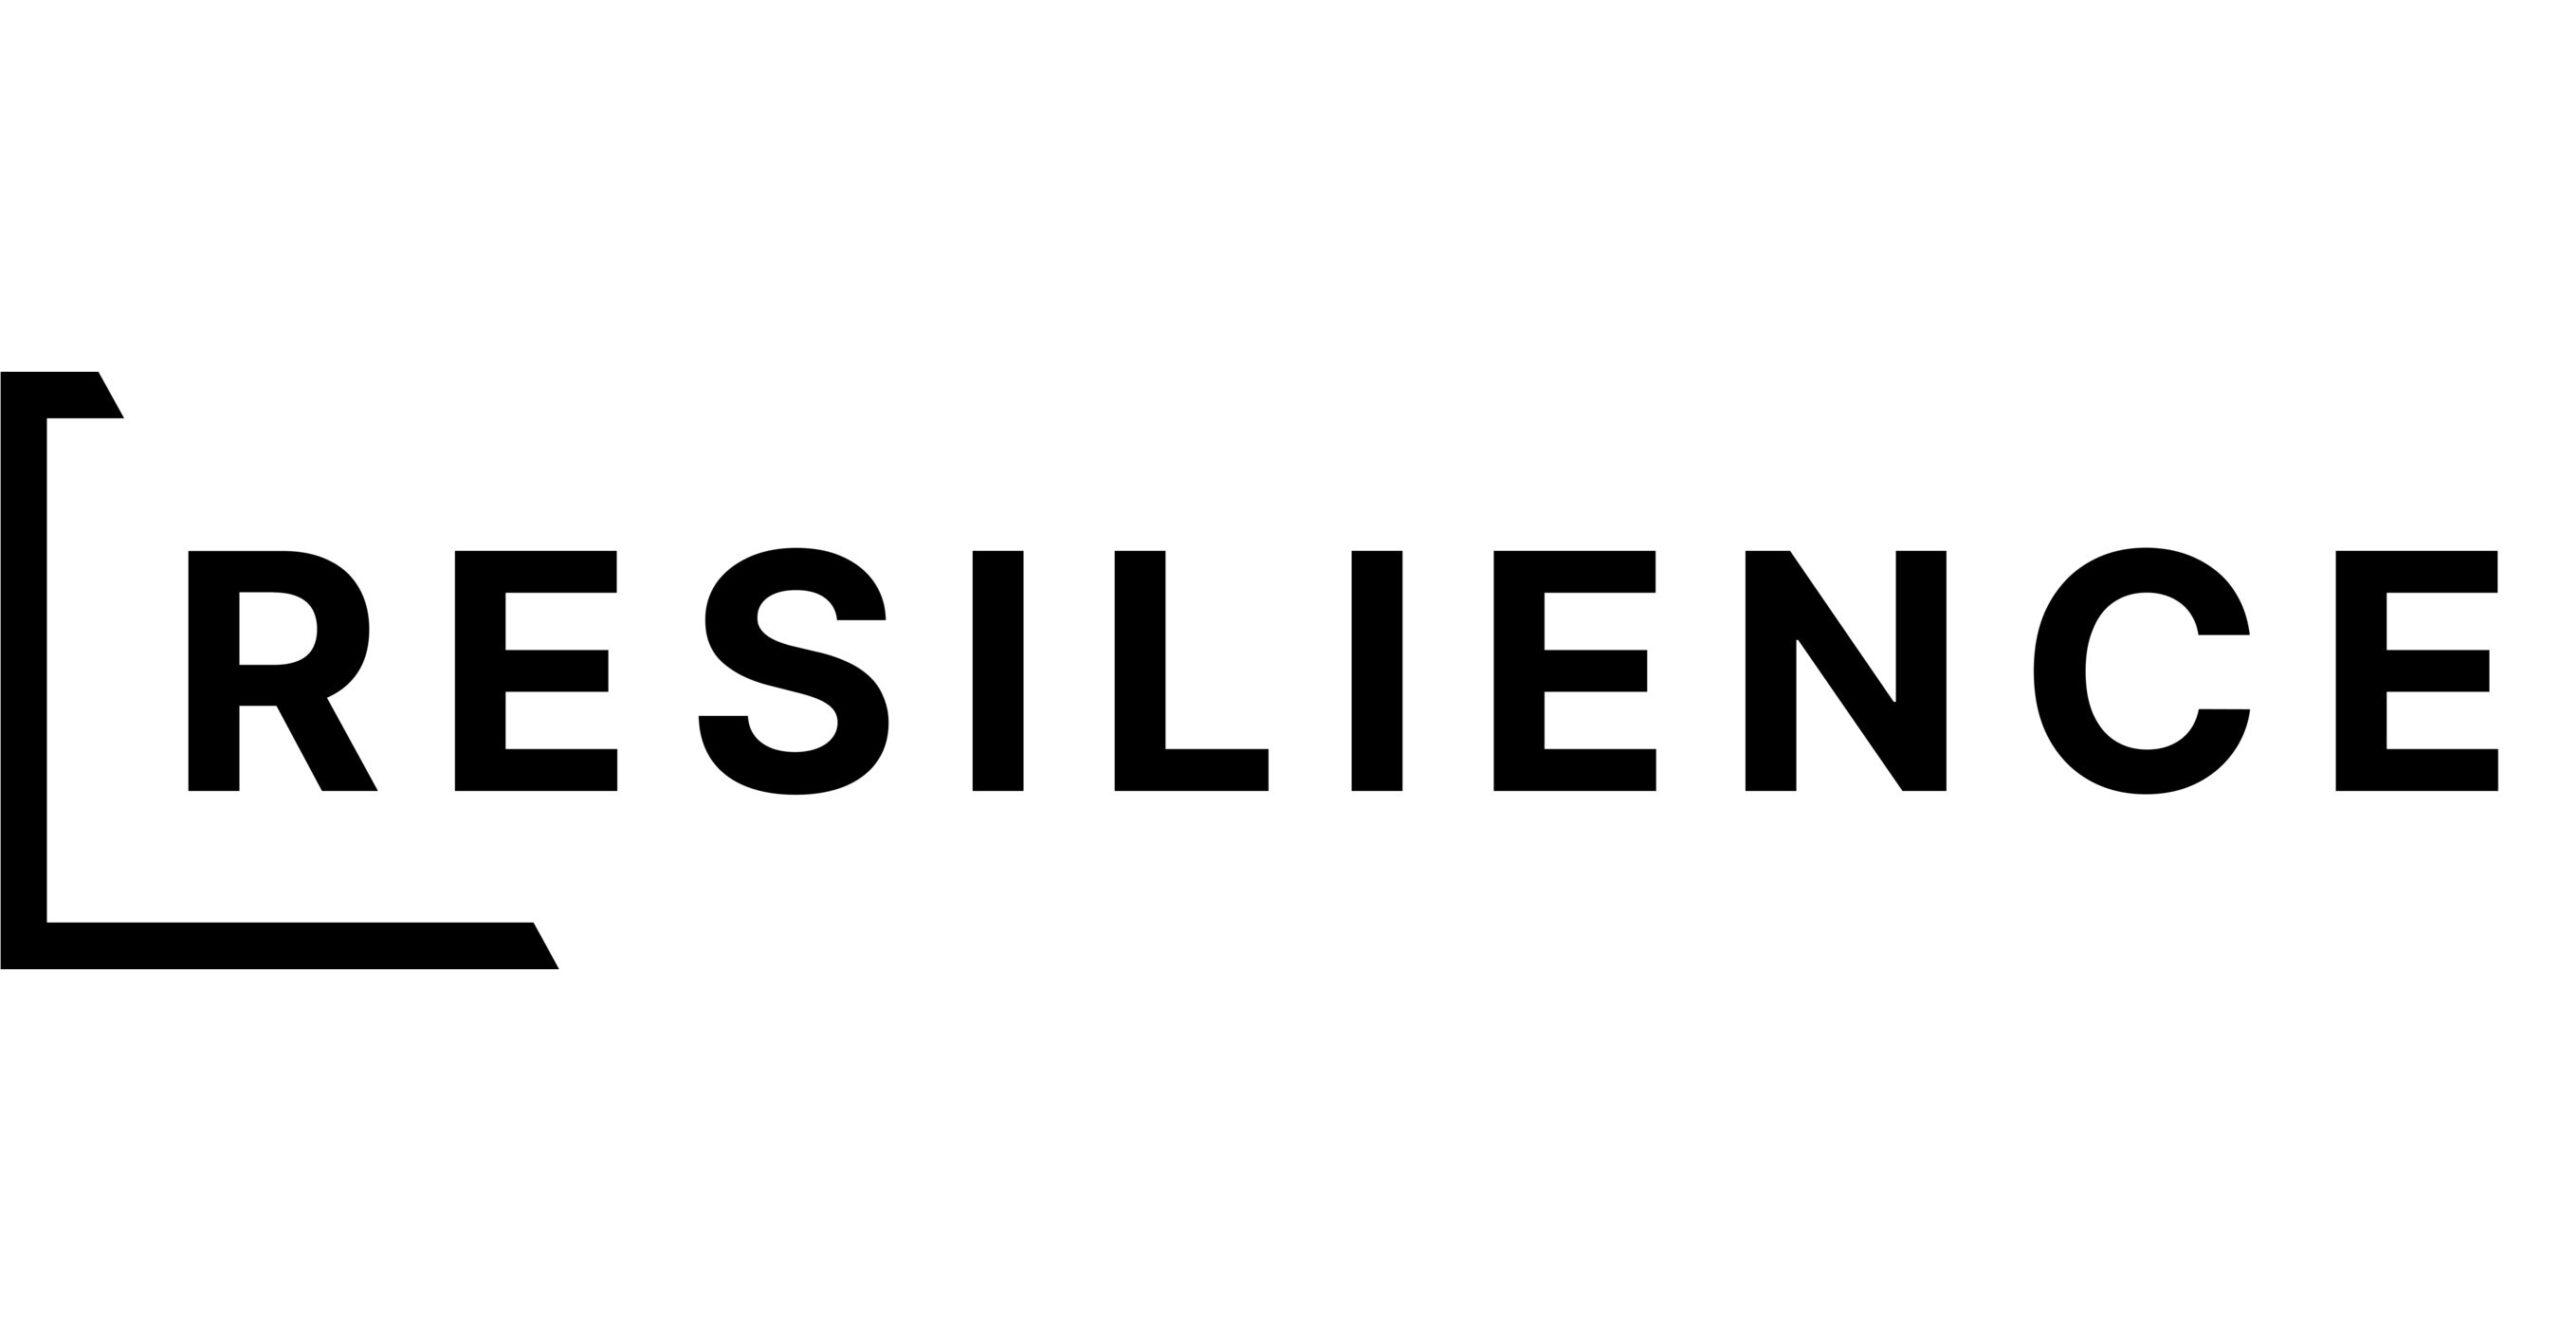 Resilience logo